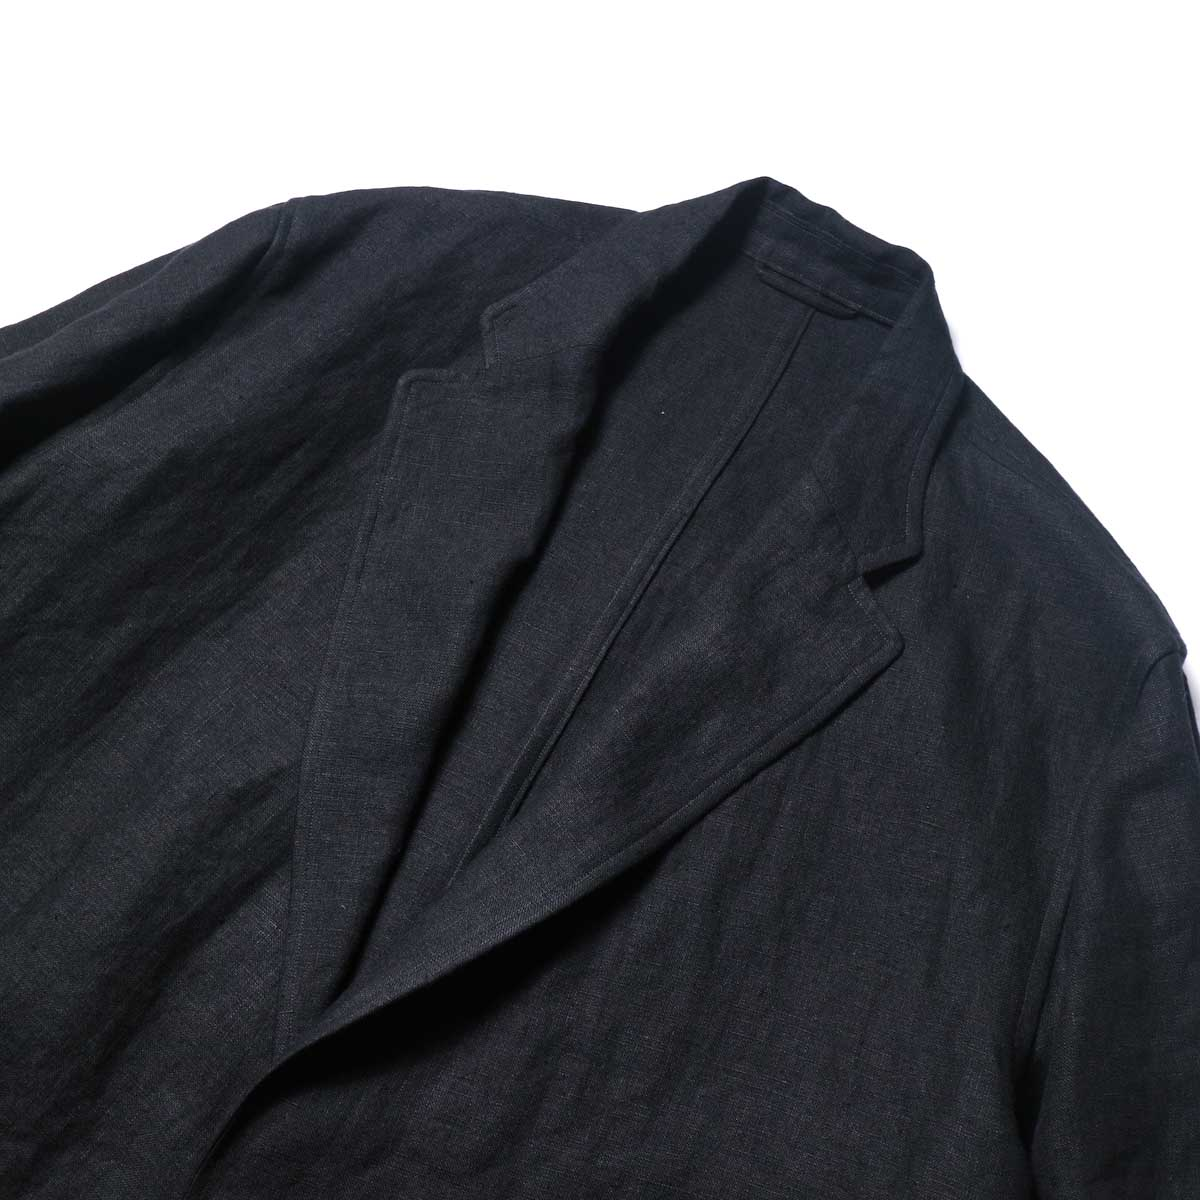 blurhms / Wash Linen Cardigan Jacket (Black)ノッチドラペル